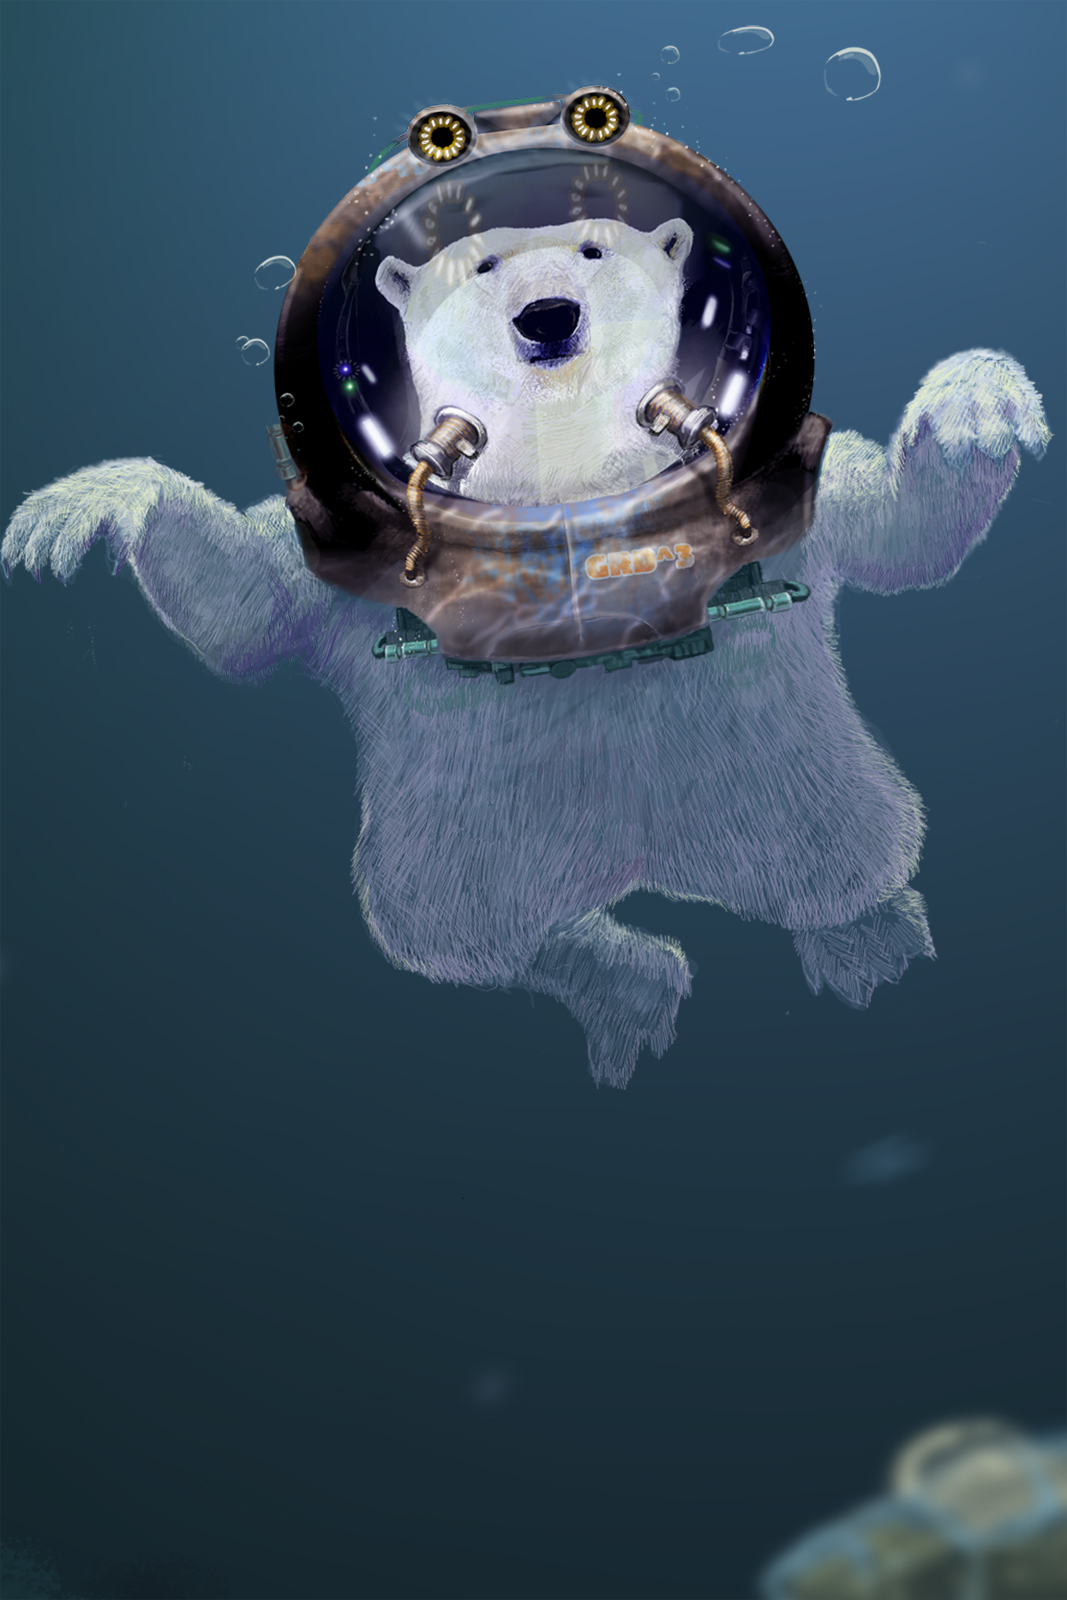 Xoanbaltar polar bear detail 1 3e8b9179 mox8